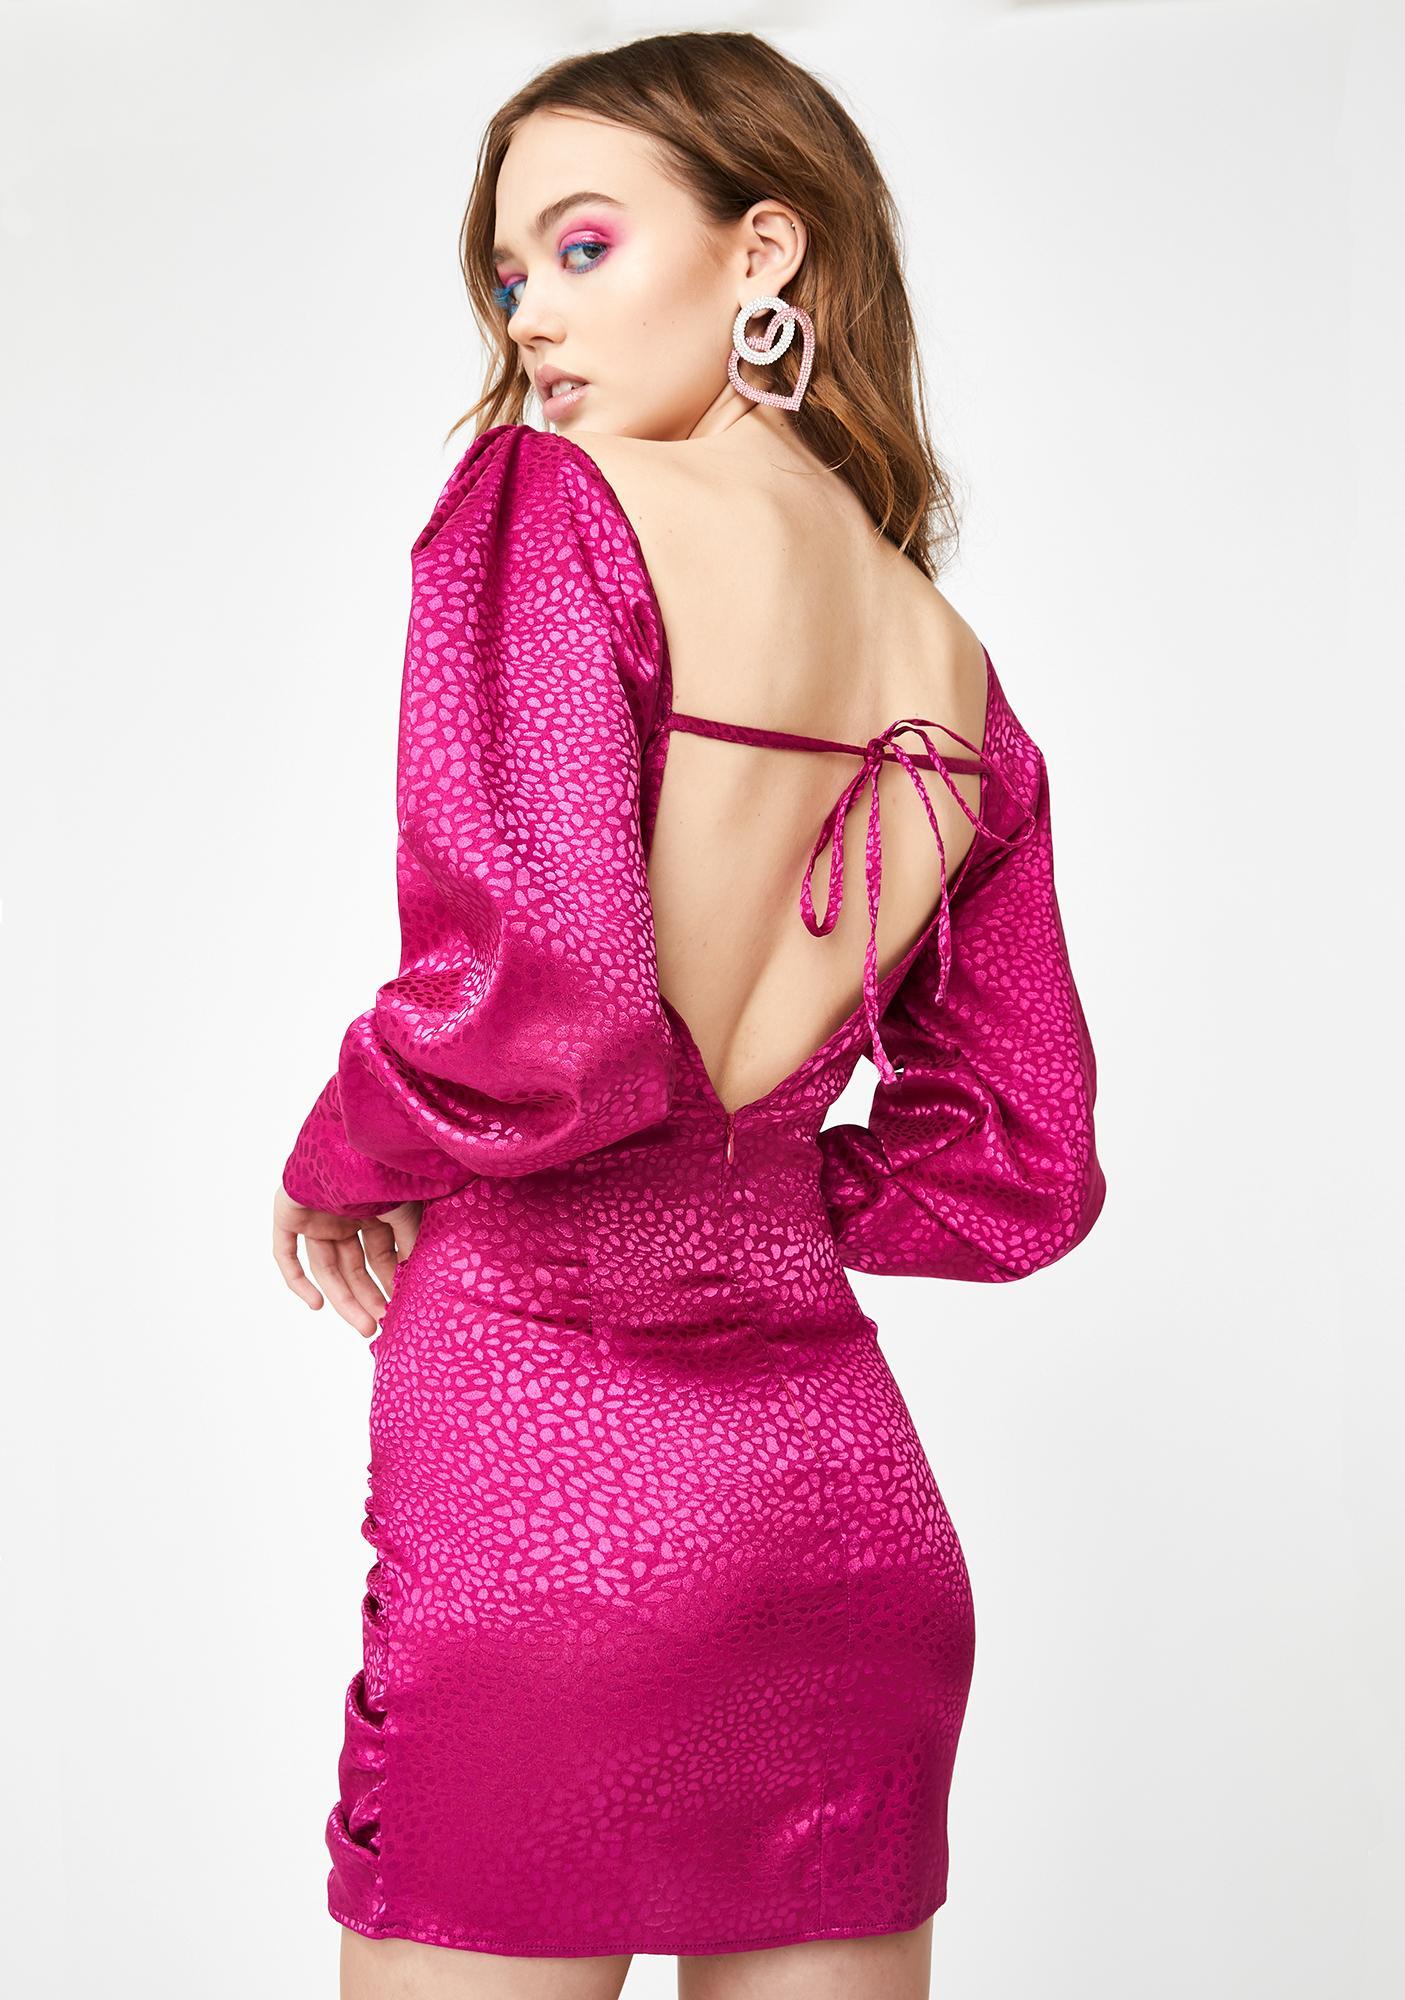 Lashes of London Gypsy Rose Mini Dress